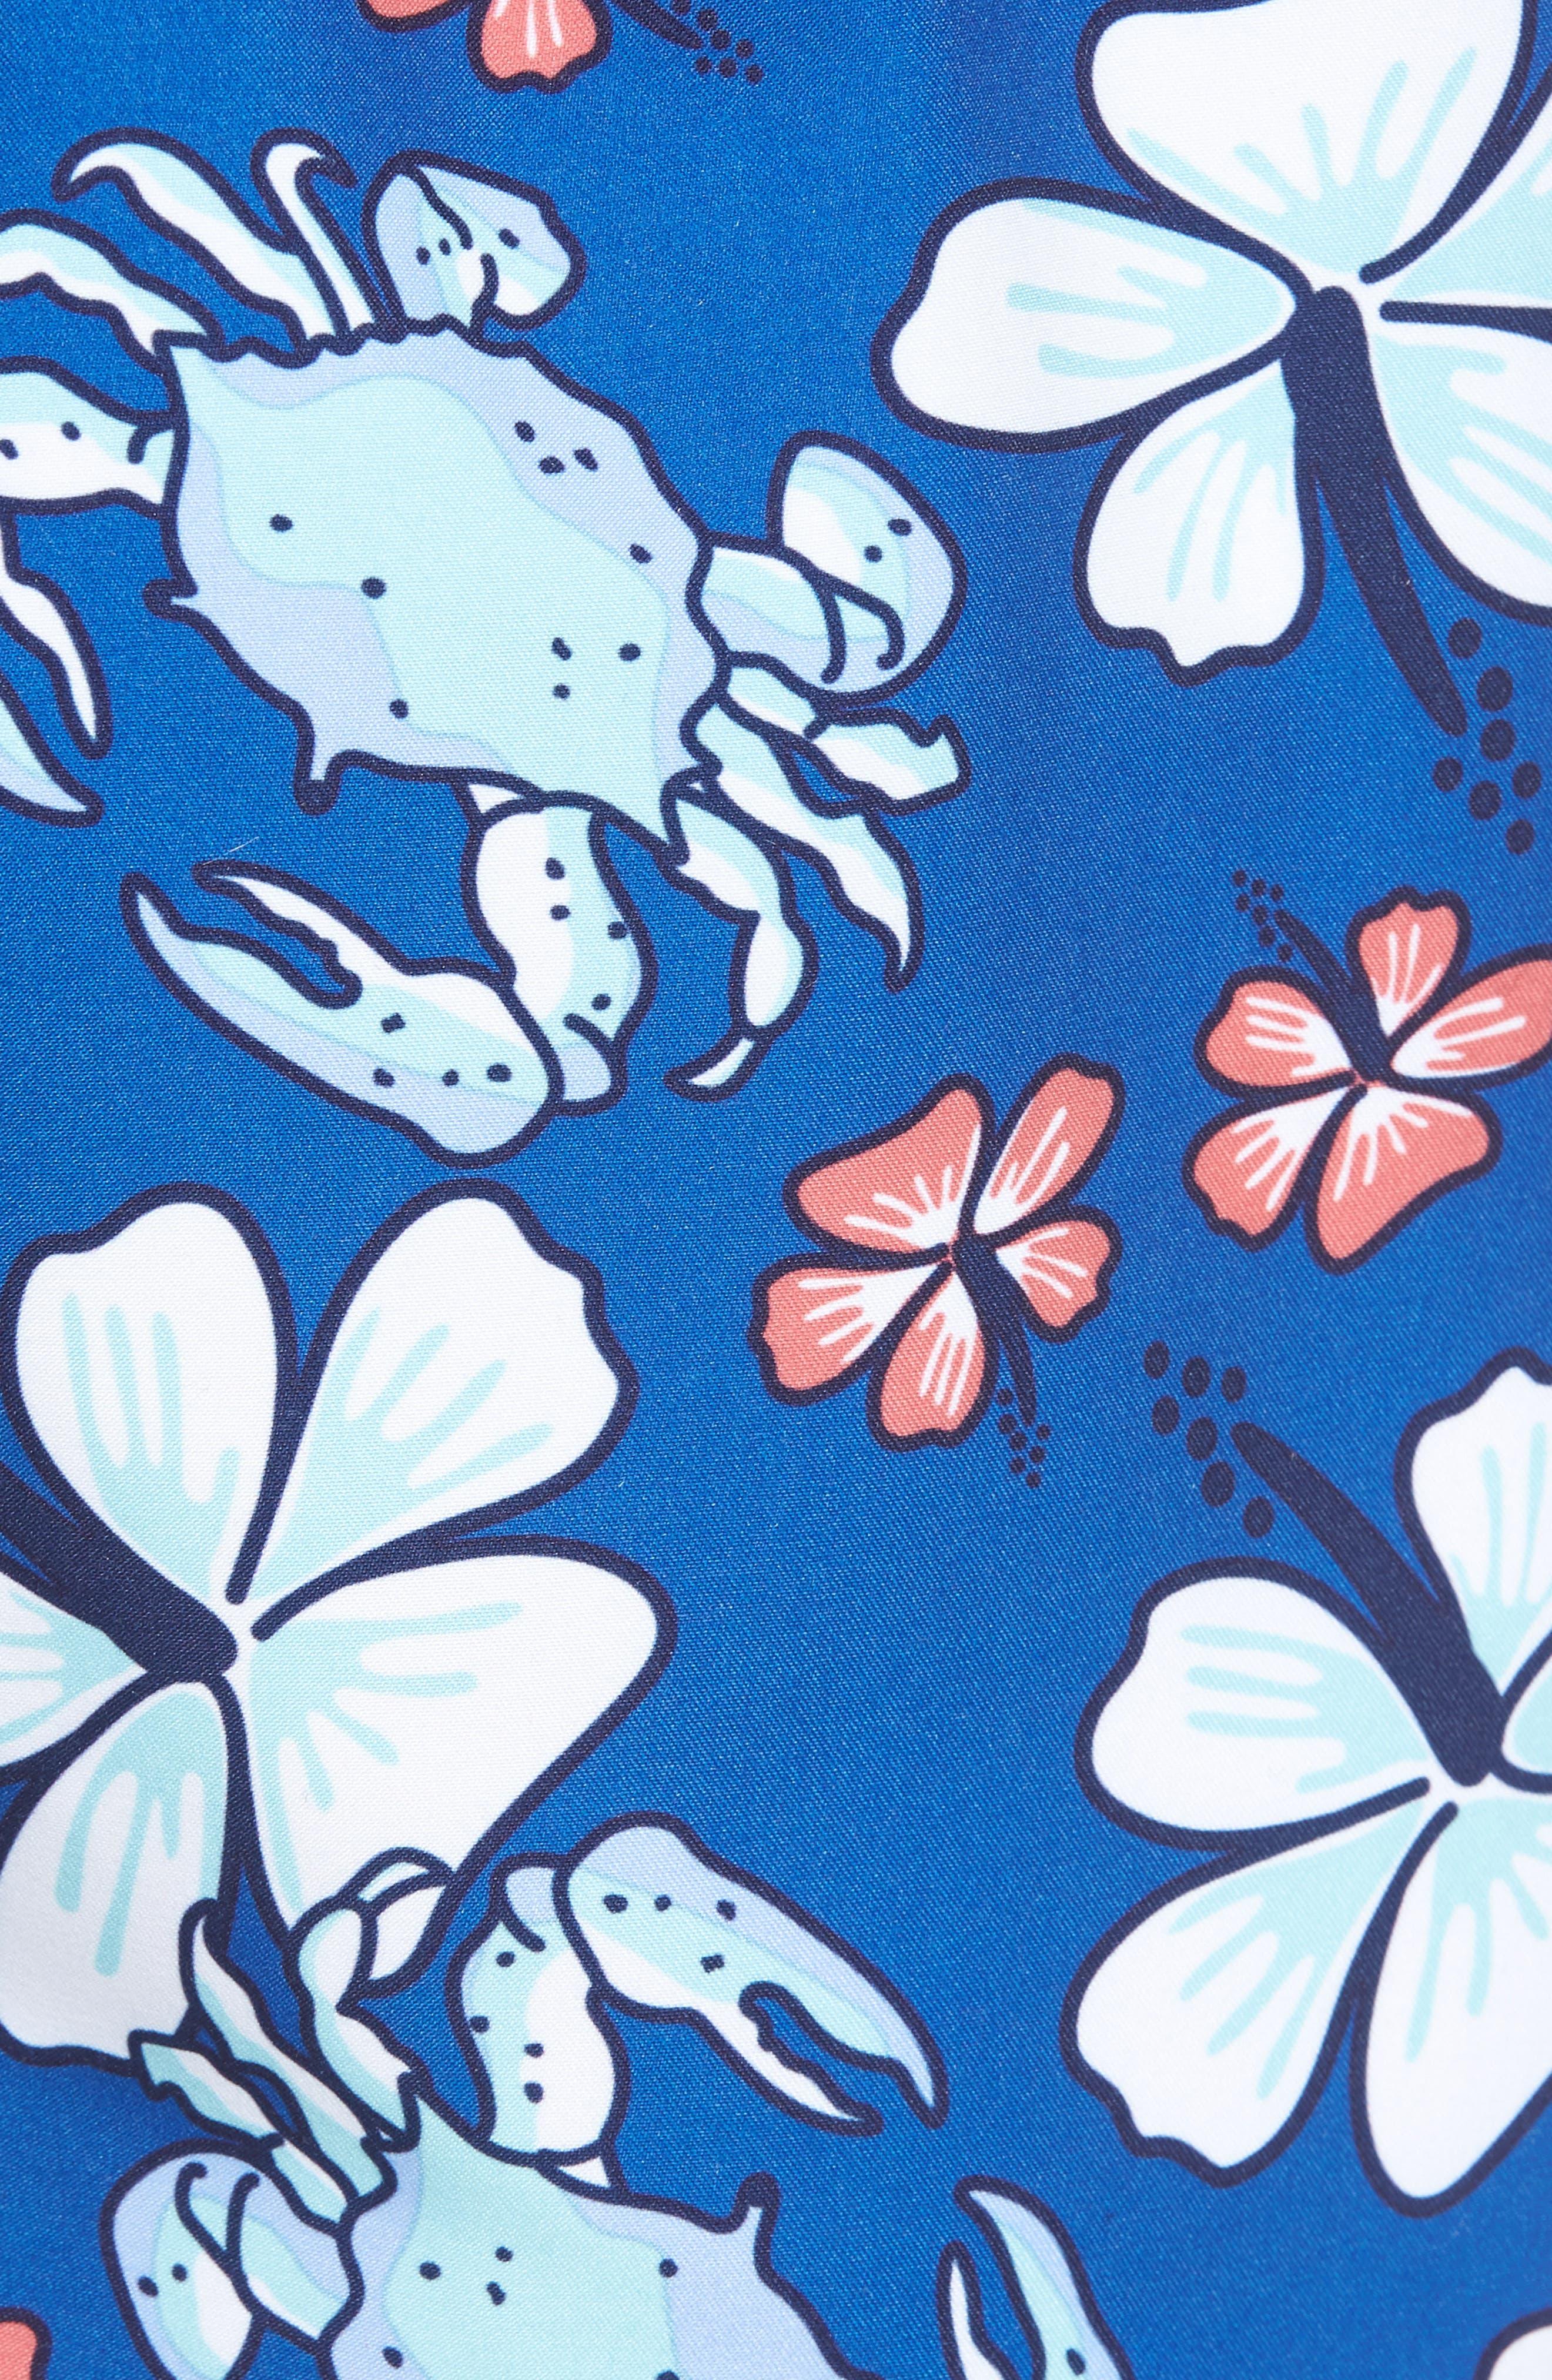 Chappy Crab Floral Swim Trunks,                             Alternate thumbnail 5, color,                             413